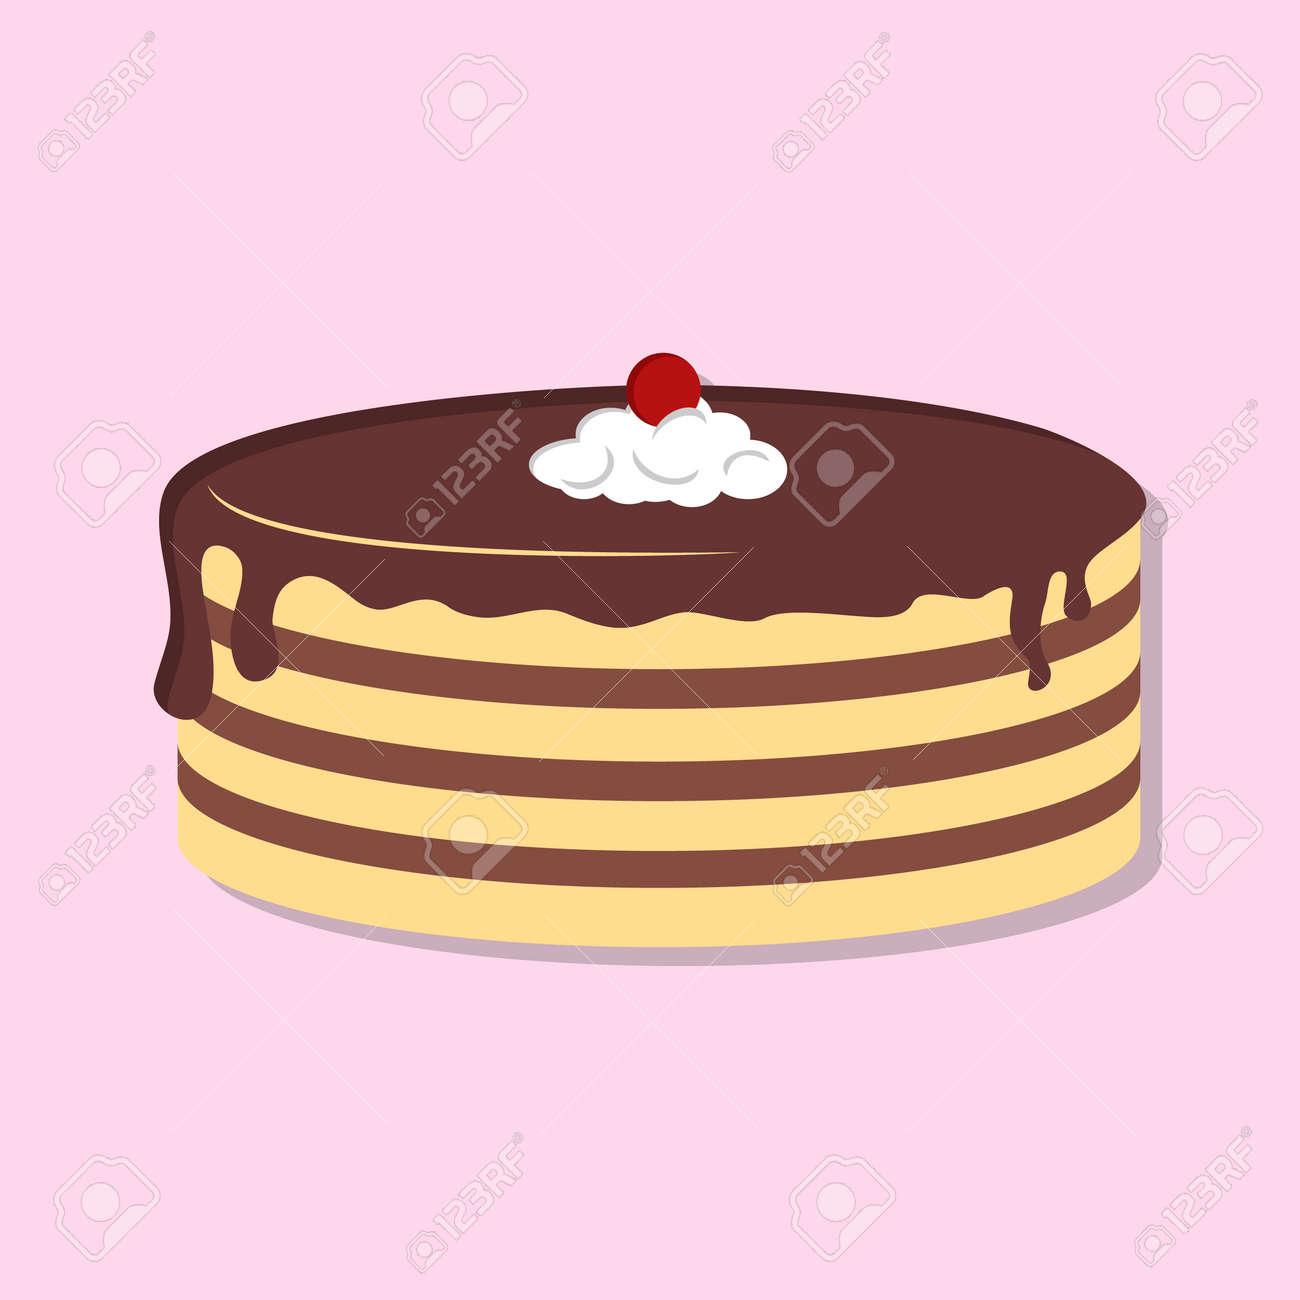 Cake isolated icon. Flat style vector illustration - 170423191